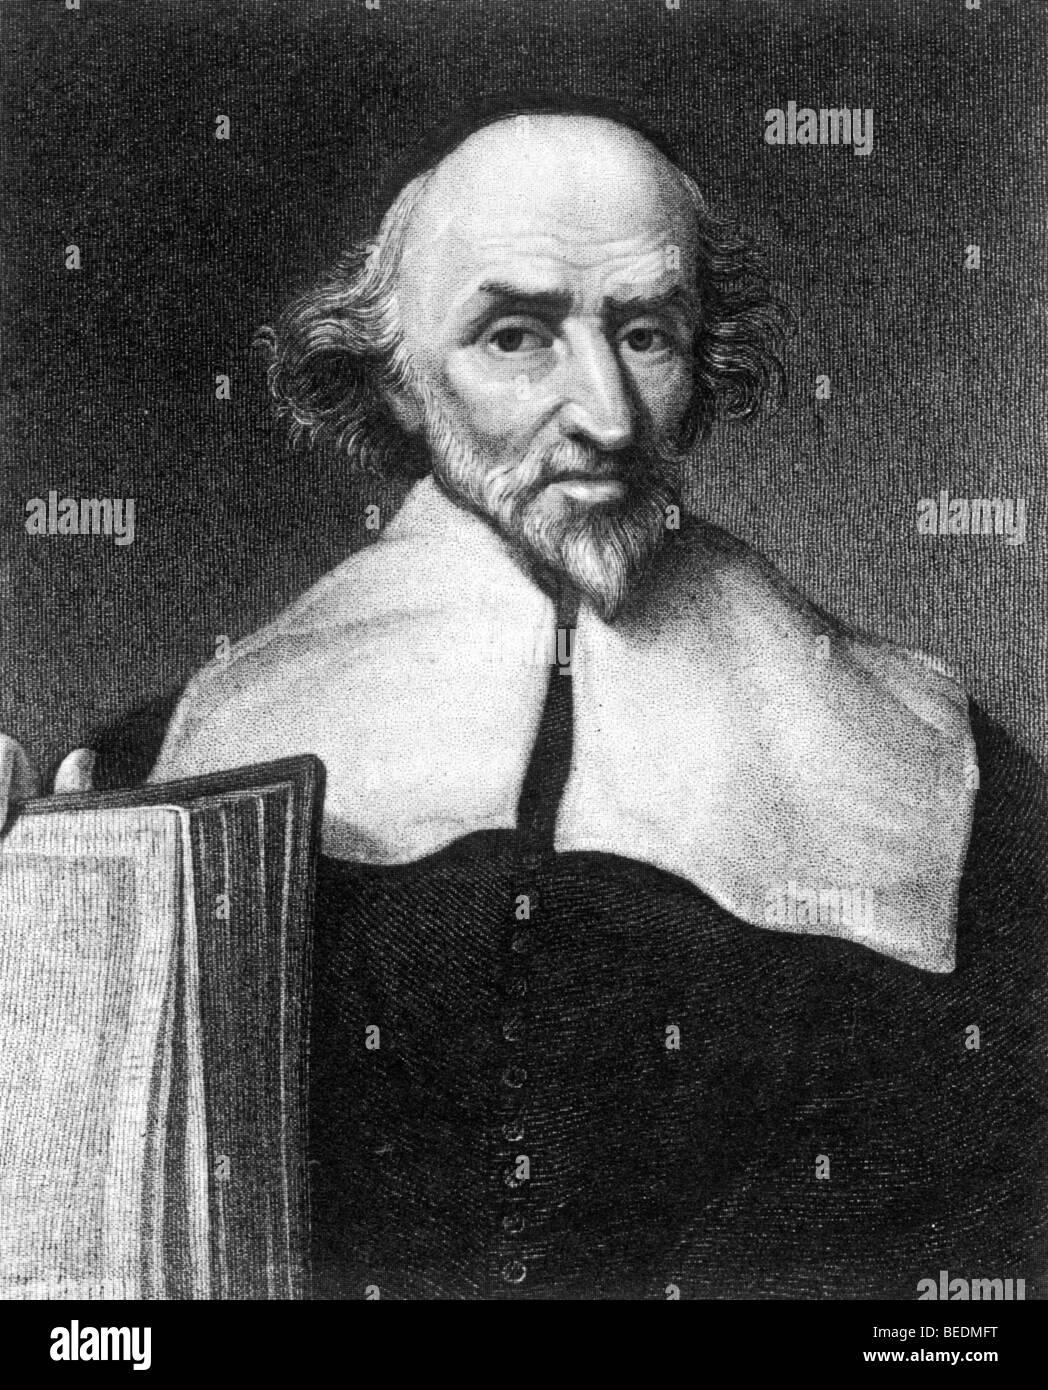 JOHN KNOX - Scottish Protestant reformer (c 1513-1572) - Stock Image